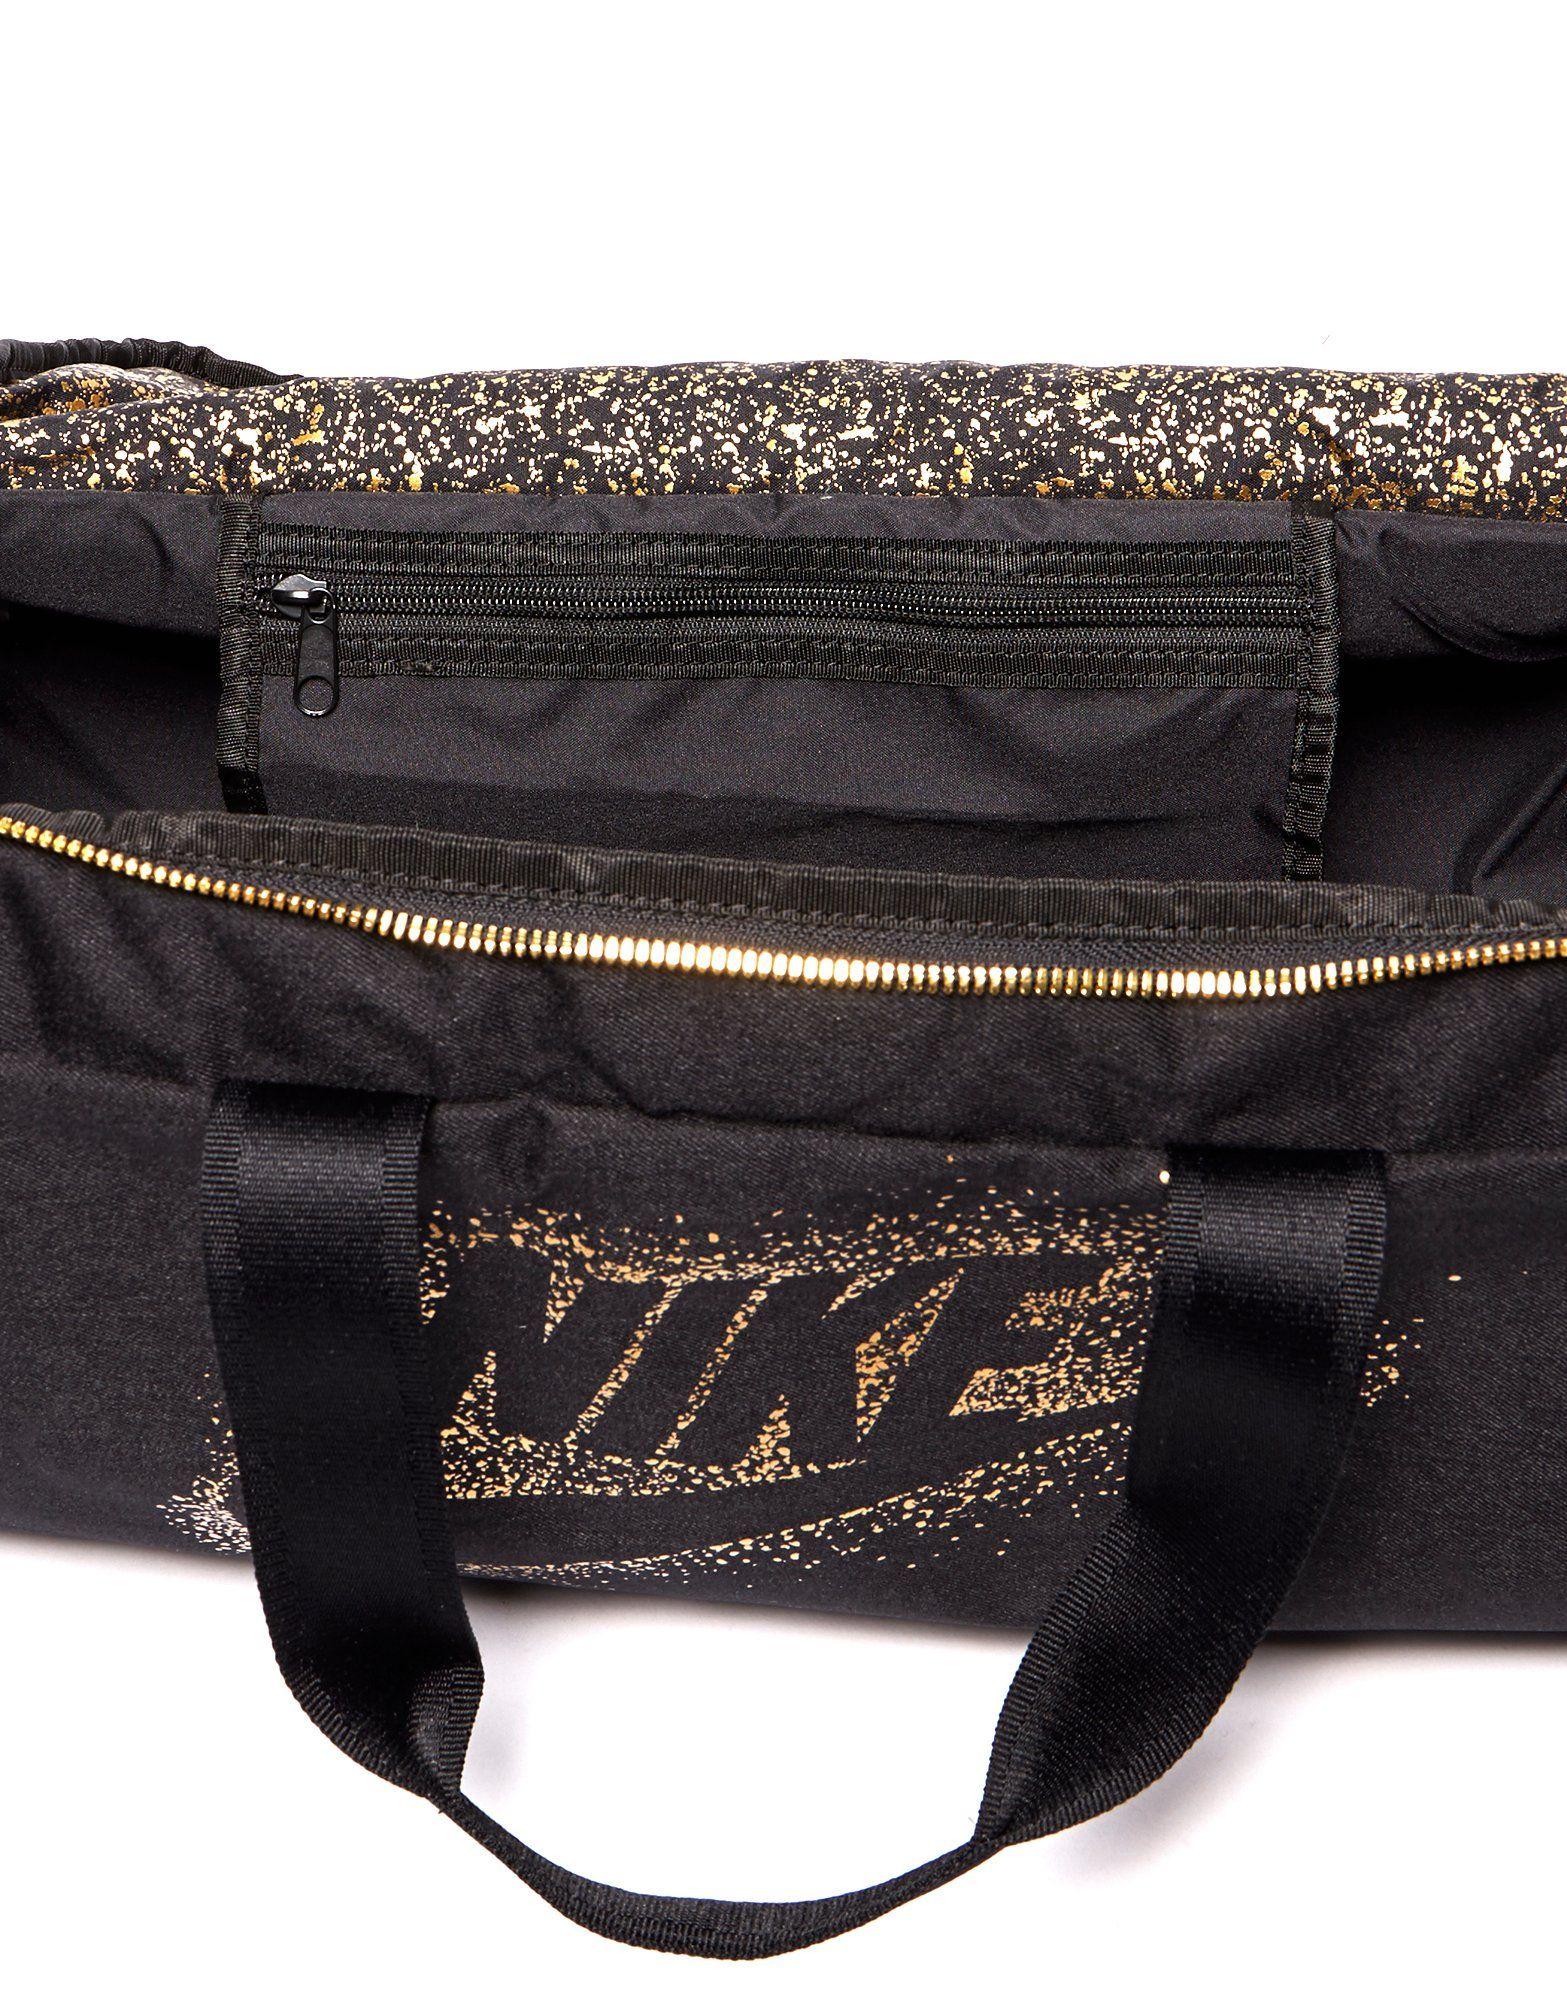 Nike Metallic Duffel Bag